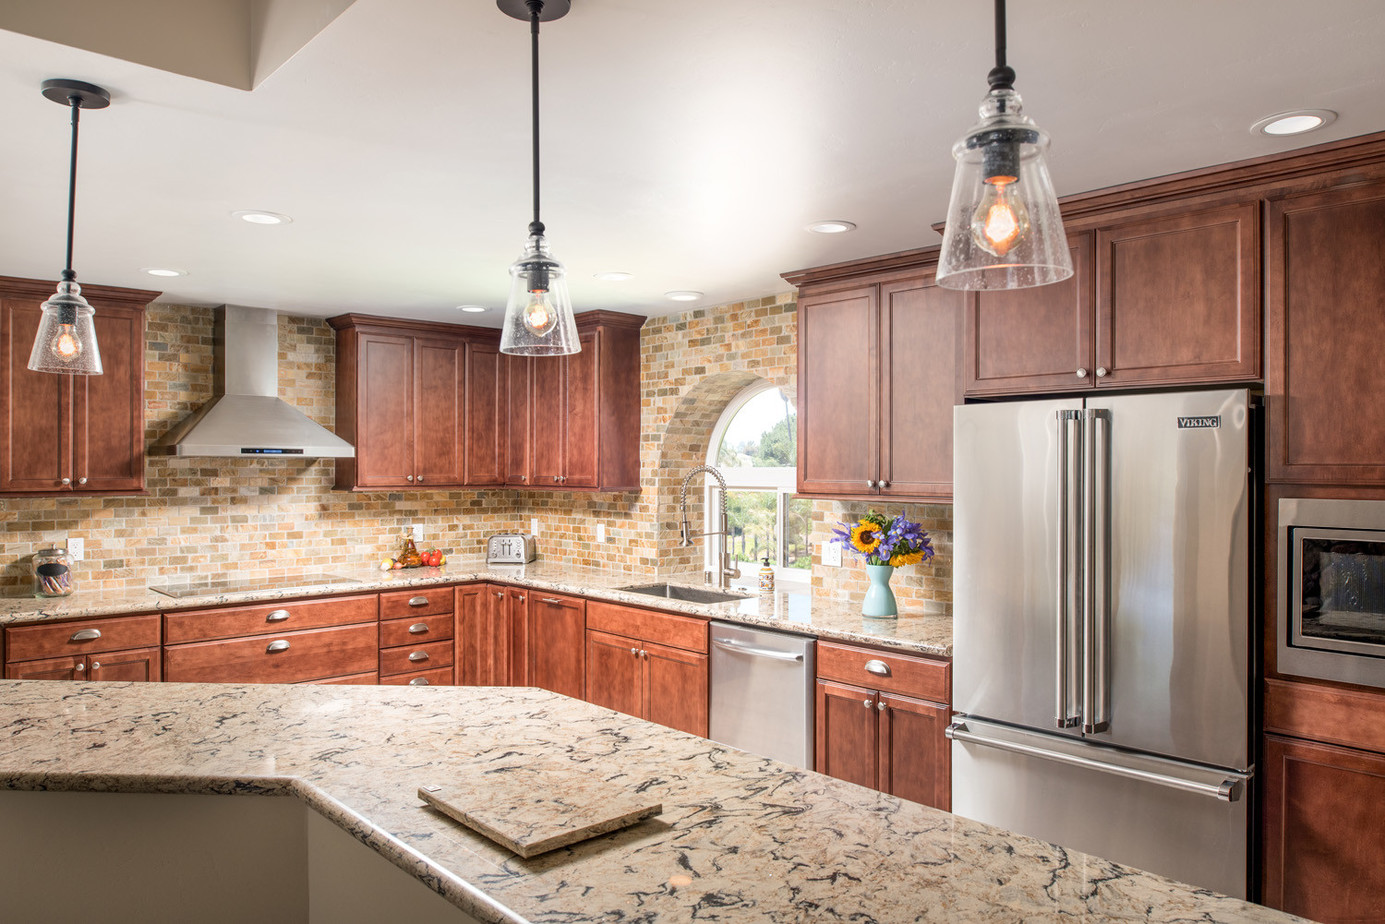 Starmark kitchen cabinets with Cambria quartz countertop and colorful tile backsplash